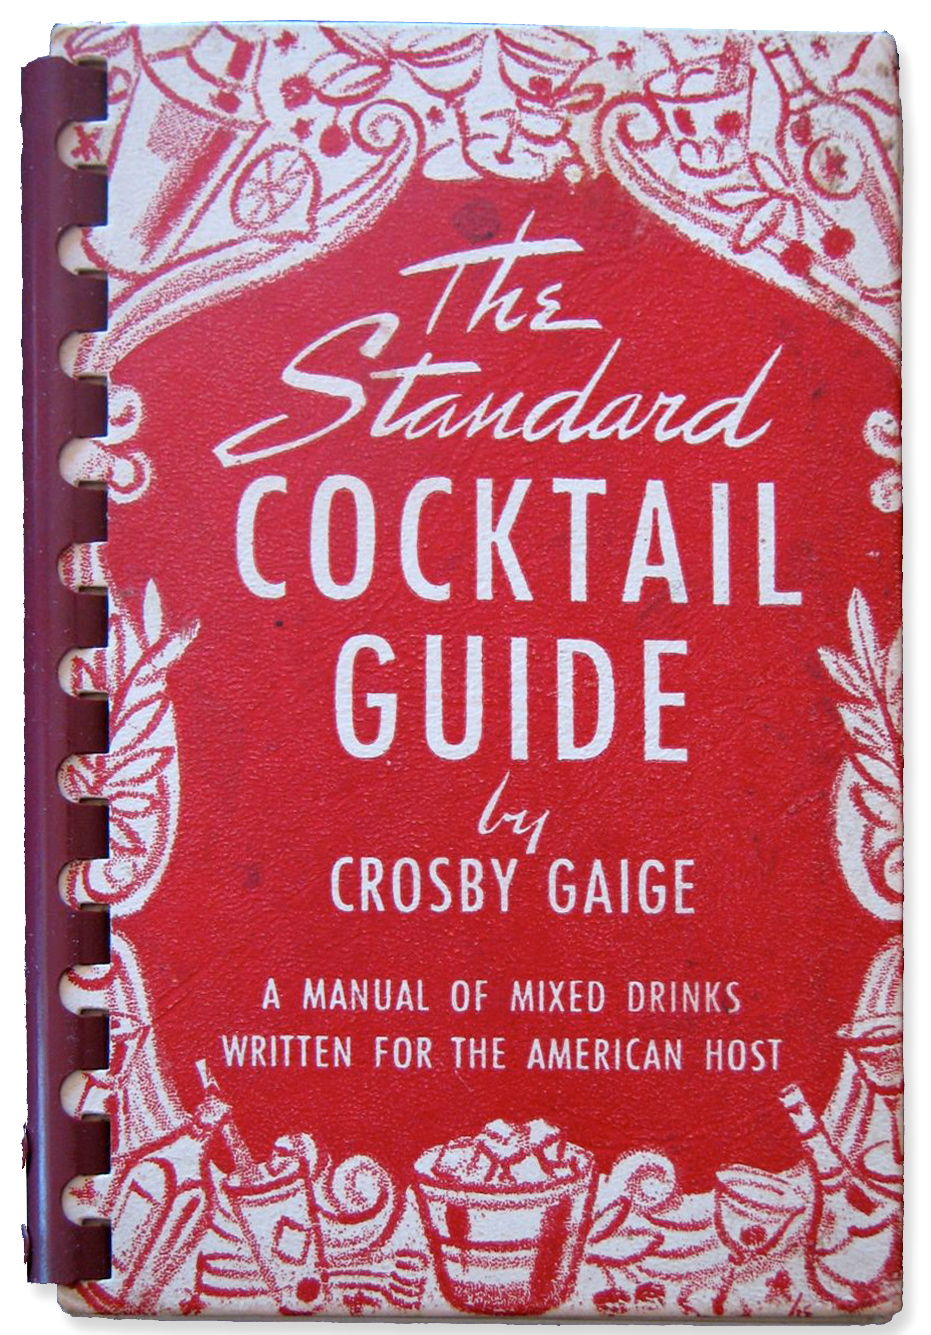 The Standard Cocktail Guide by Crosby Gaige 1944 via  Crosbygaige.org